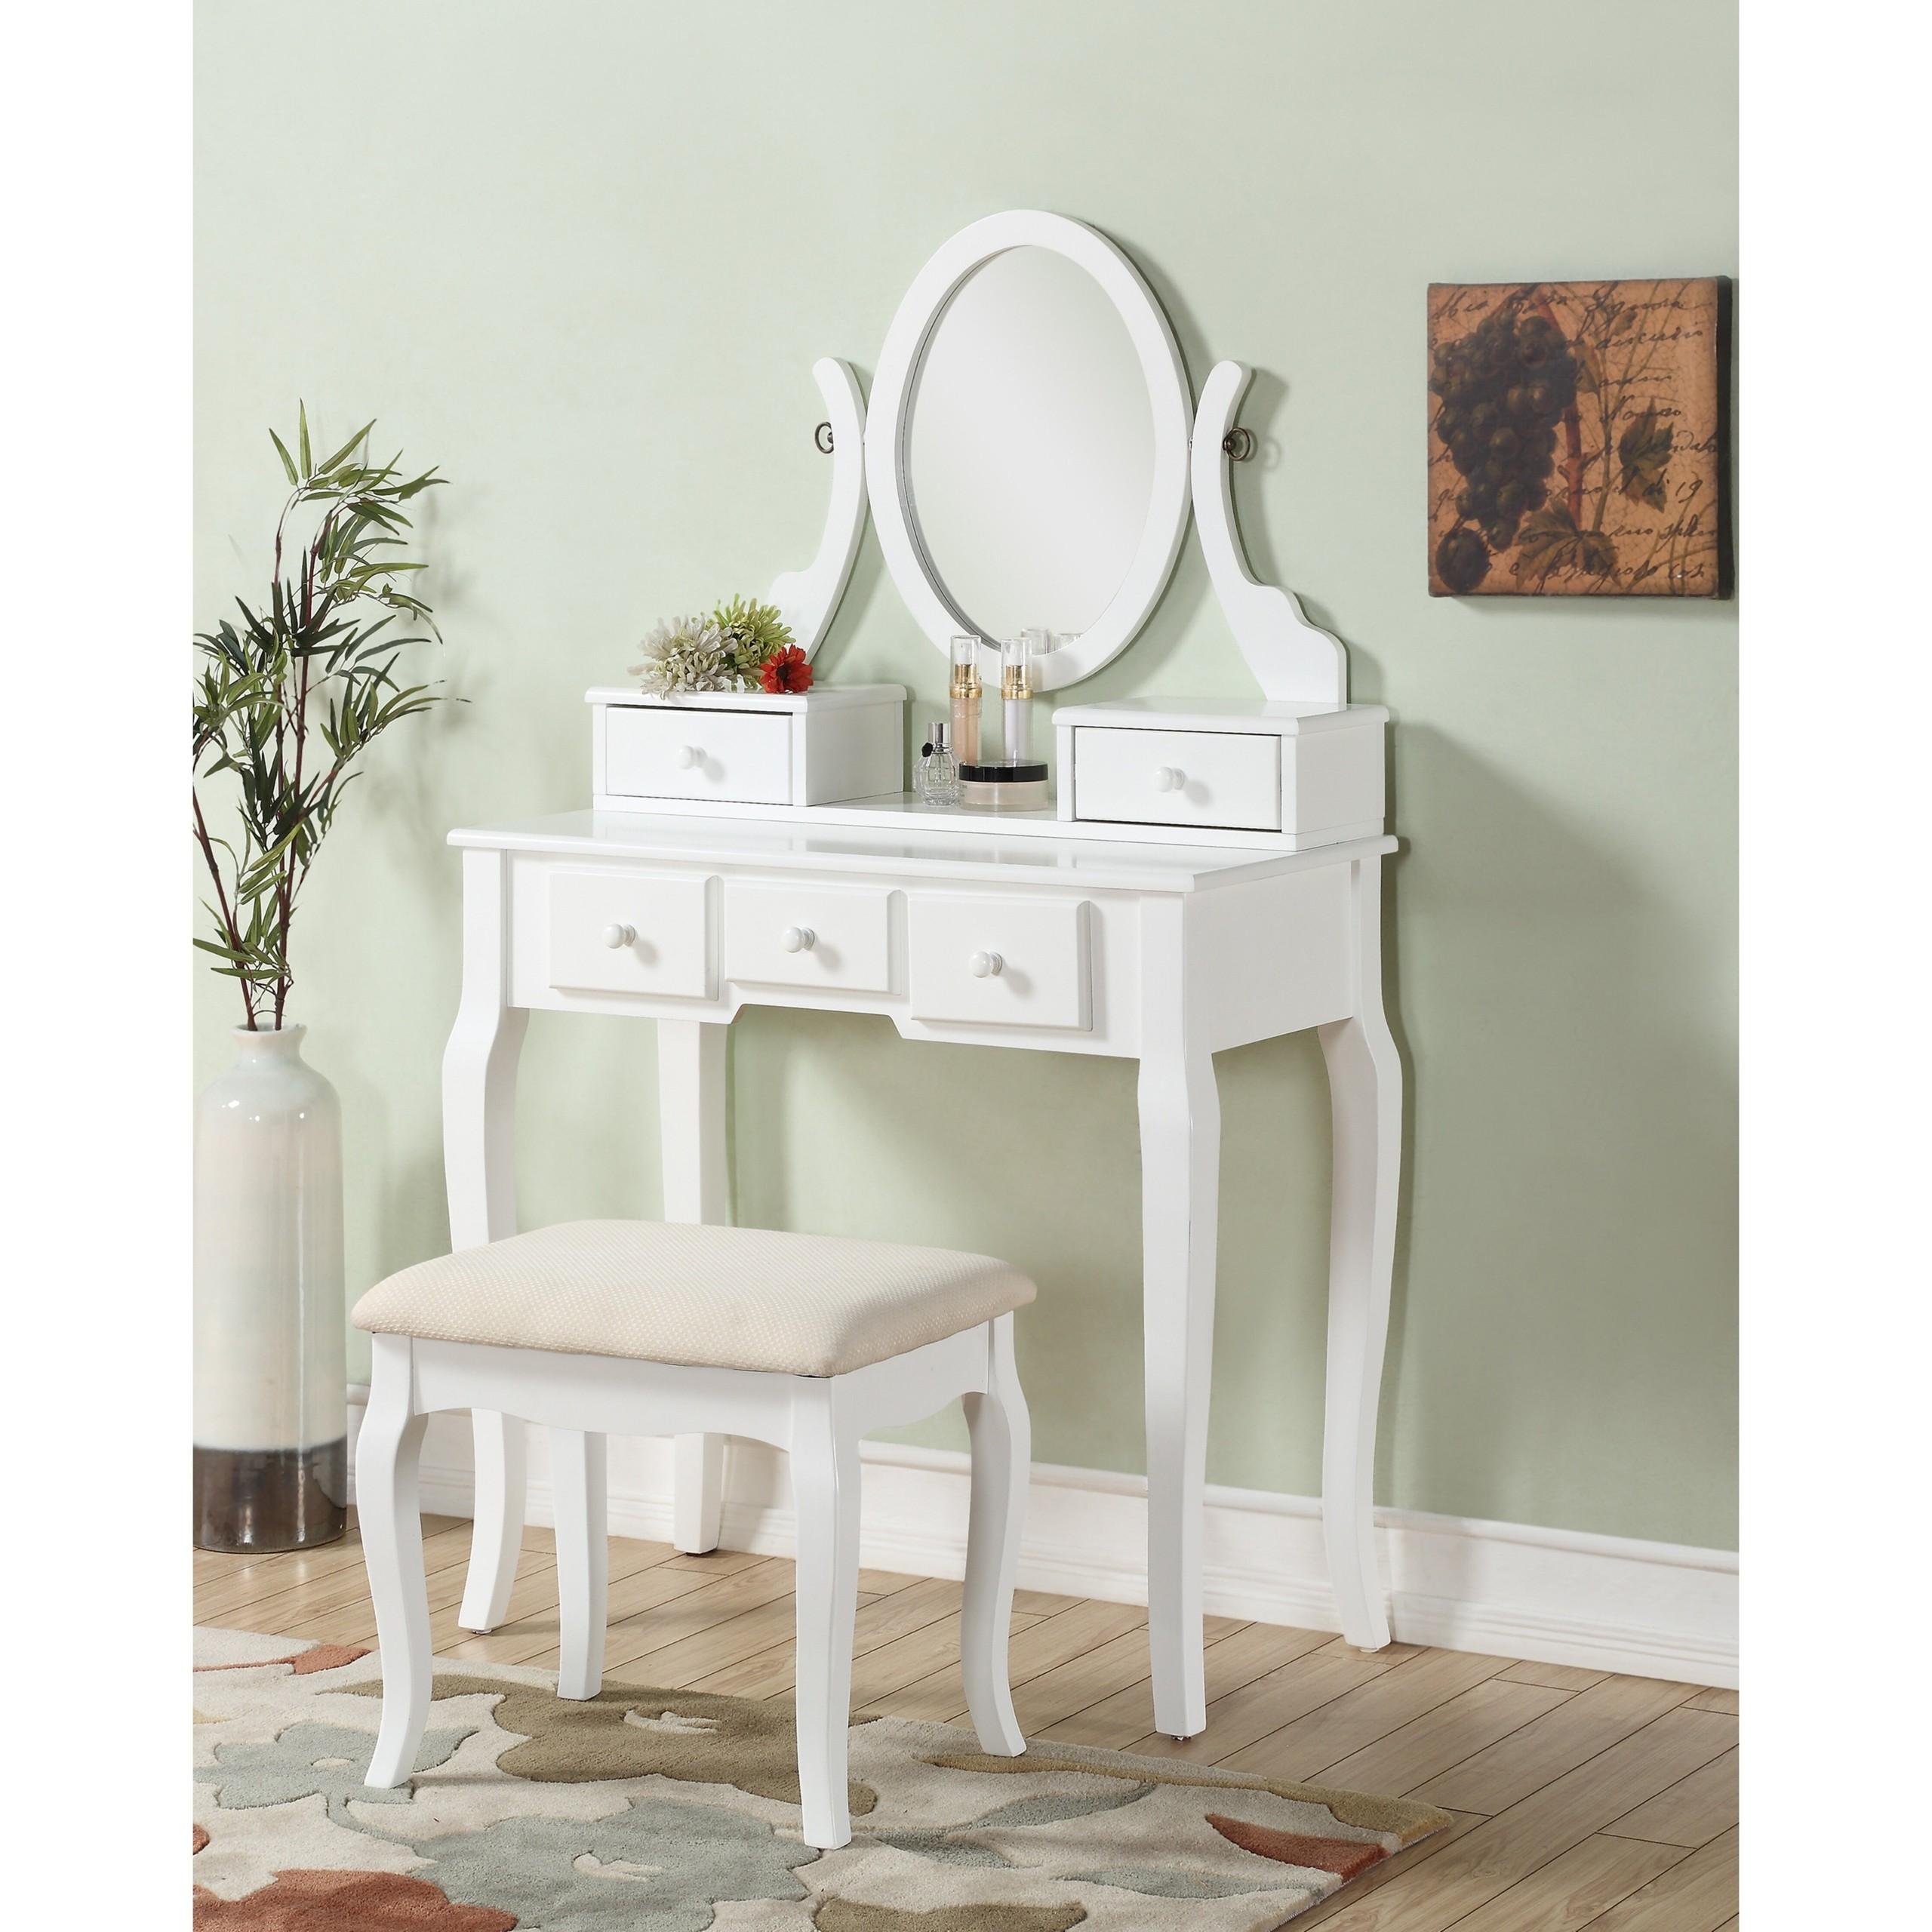 Ashley Wood Makeup Vanity Table And Stool Set , White